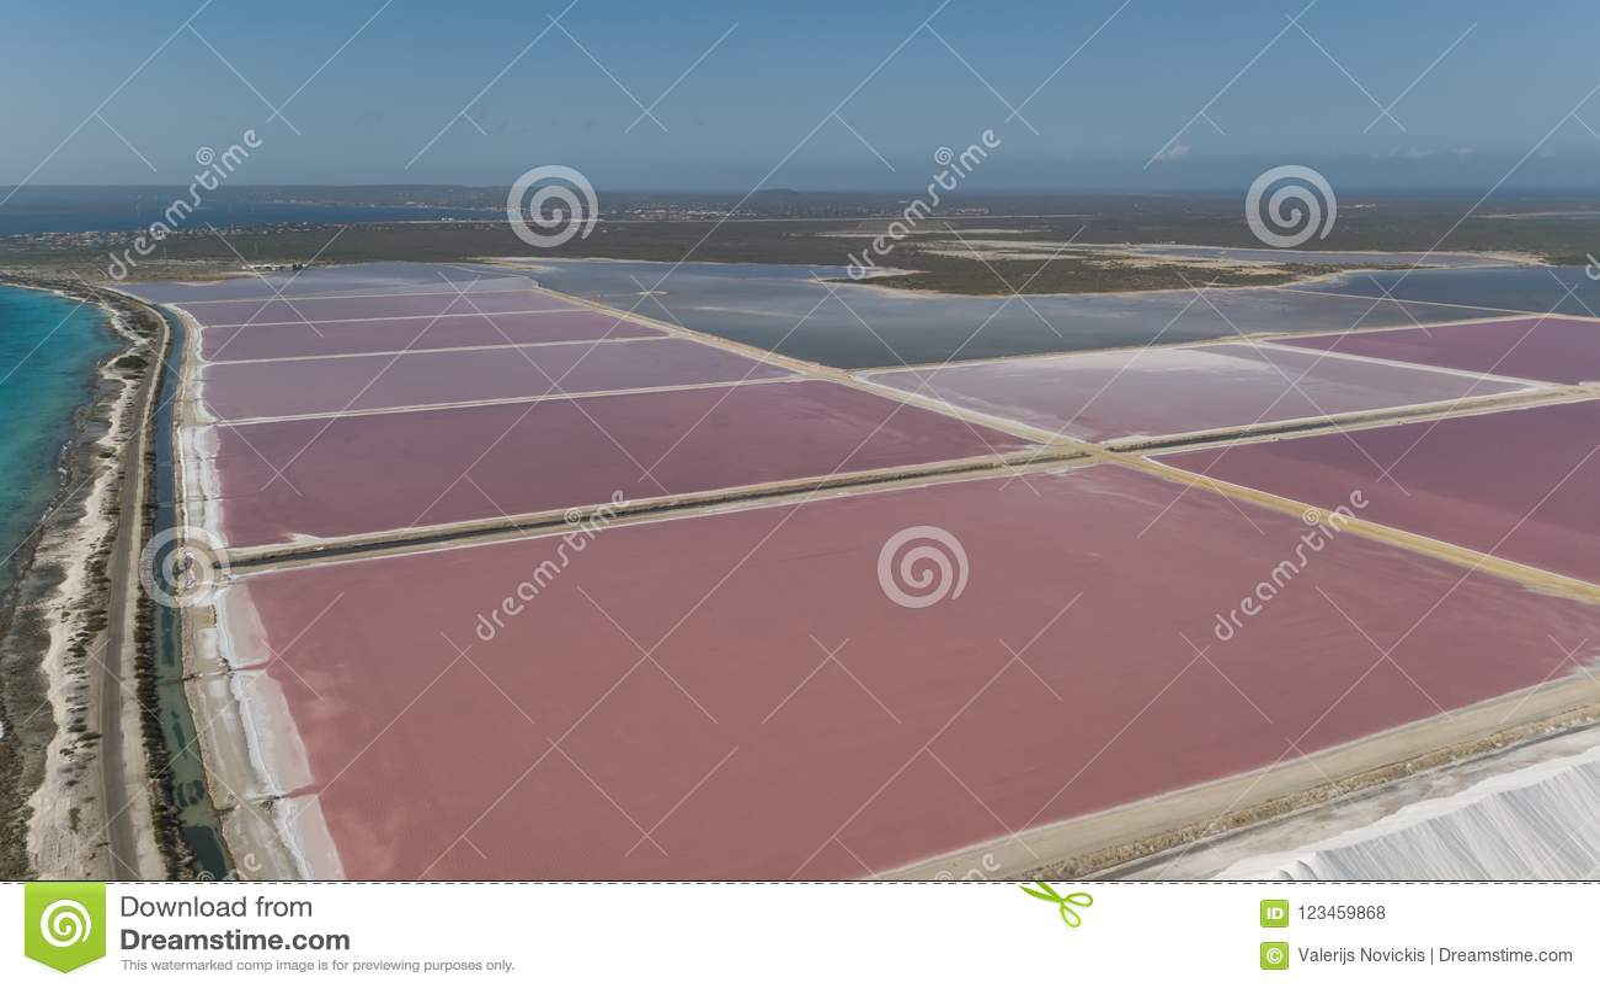 Aerial View DJI Mavic Pro Drone Top